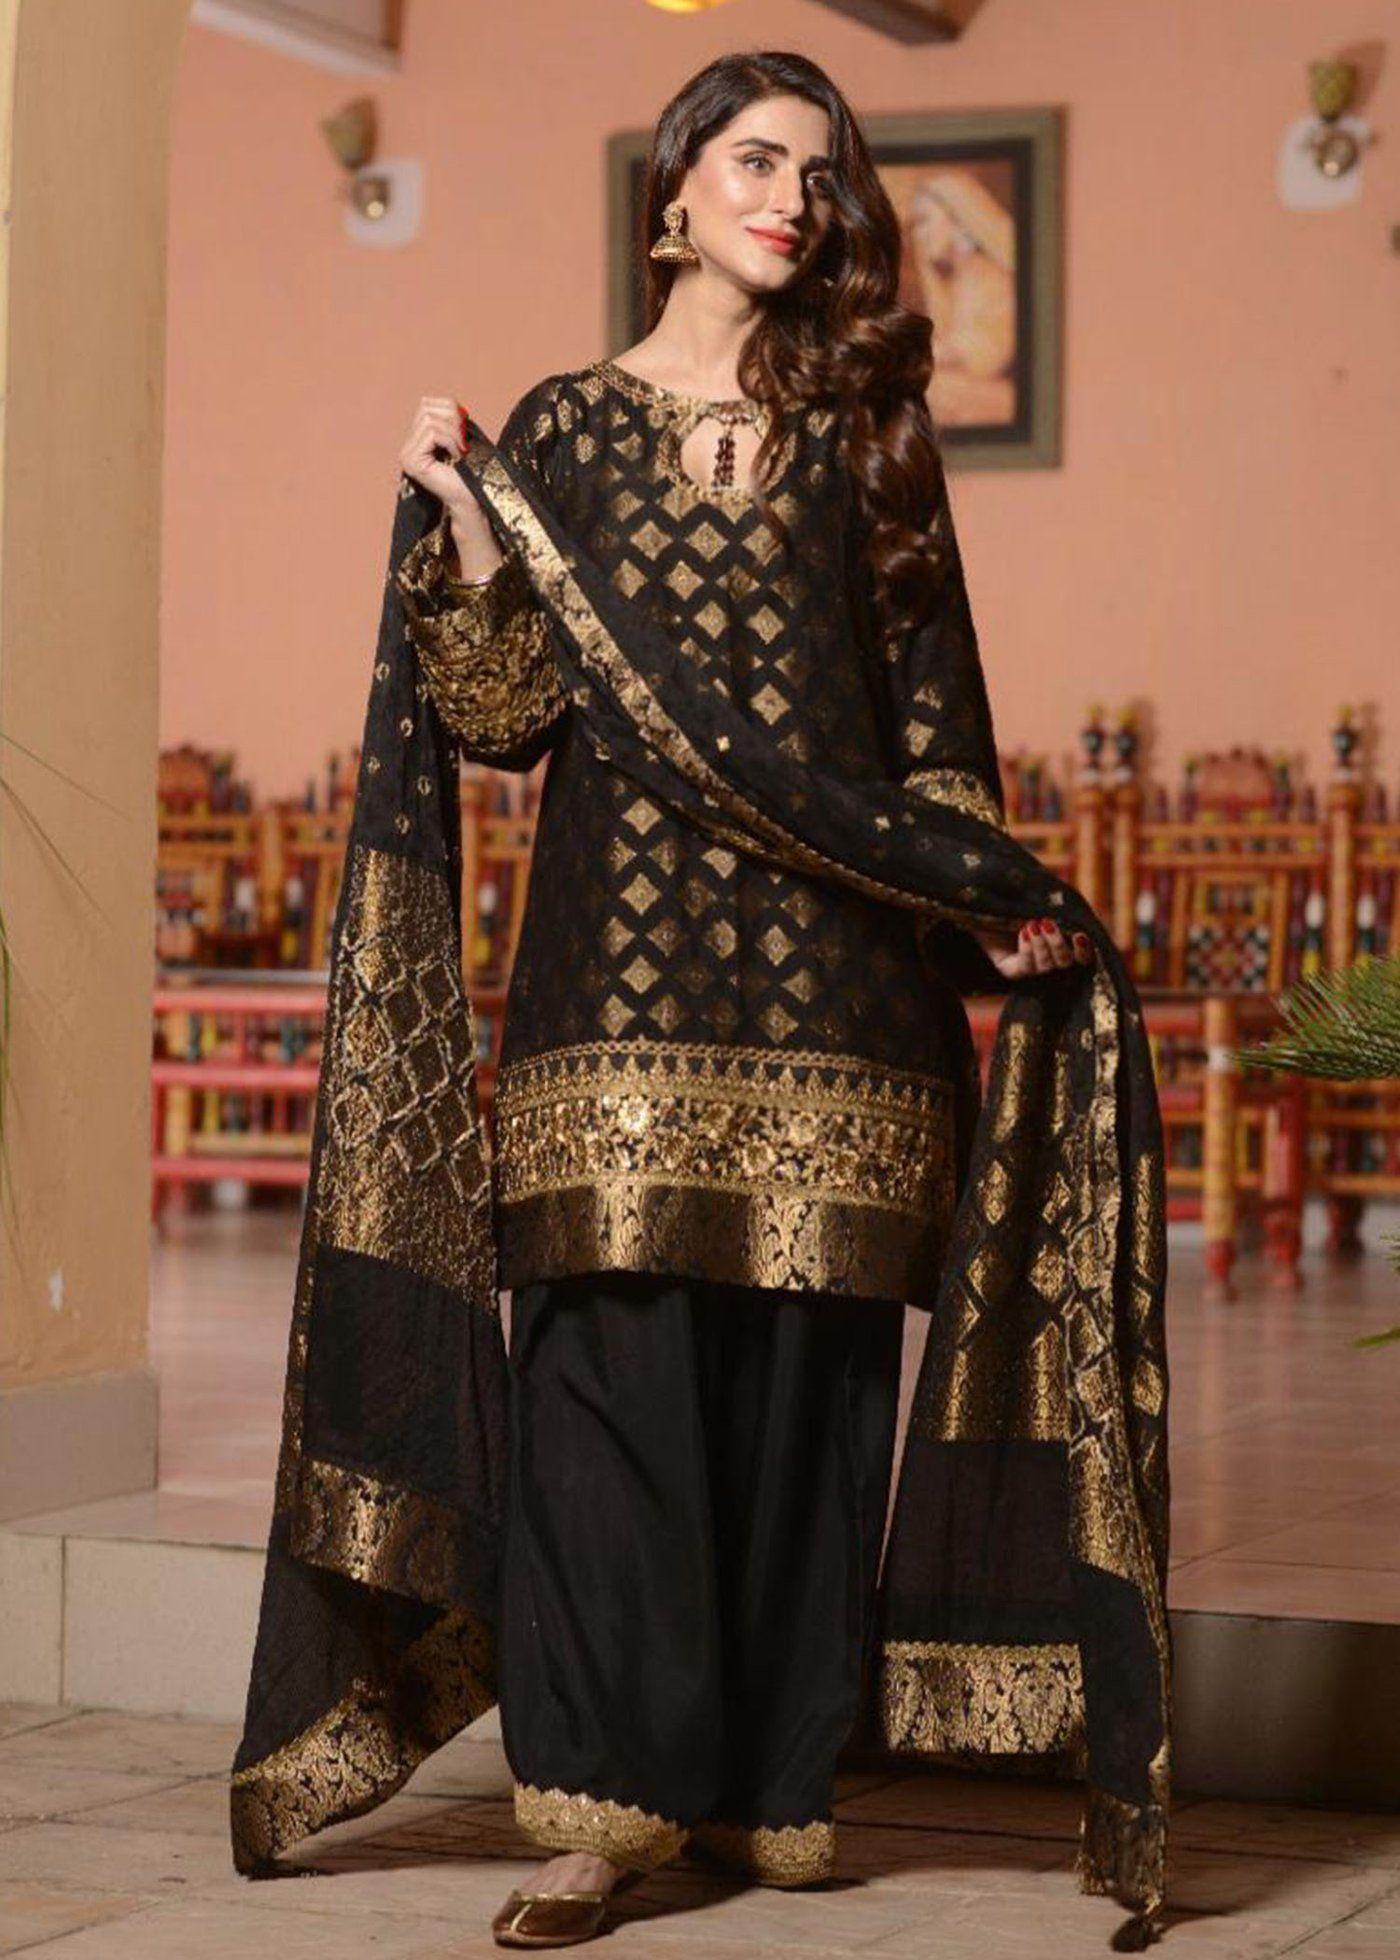 Black Dahlia Stylish Black Dress Stylish Dresses For Girls Stylish Party Dresses [ 1960 x 1400 Pixel ]